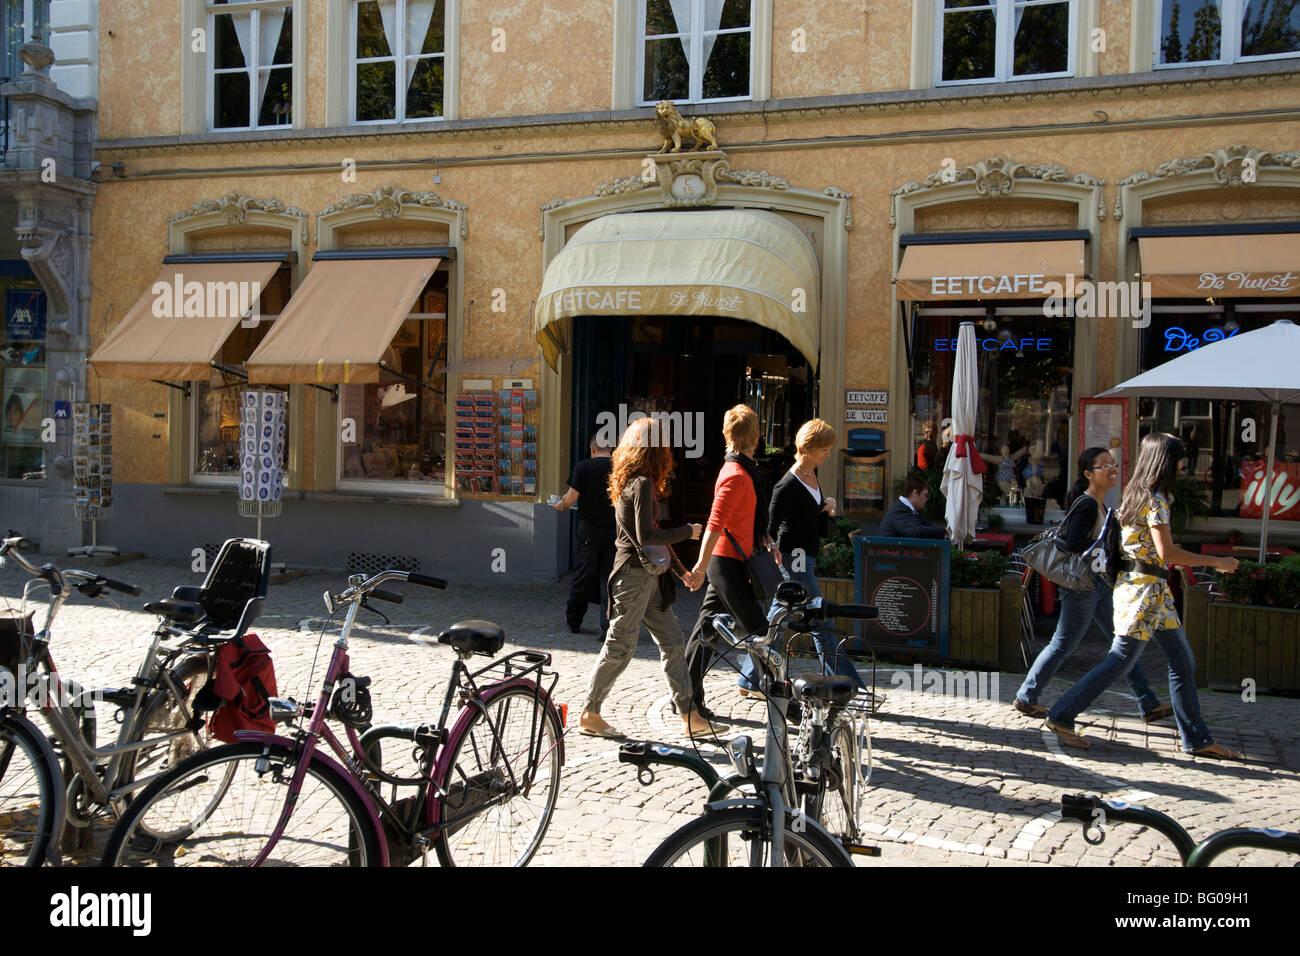 Ettcafe Devust cafe in Bruges, Belgium. - Stock Image